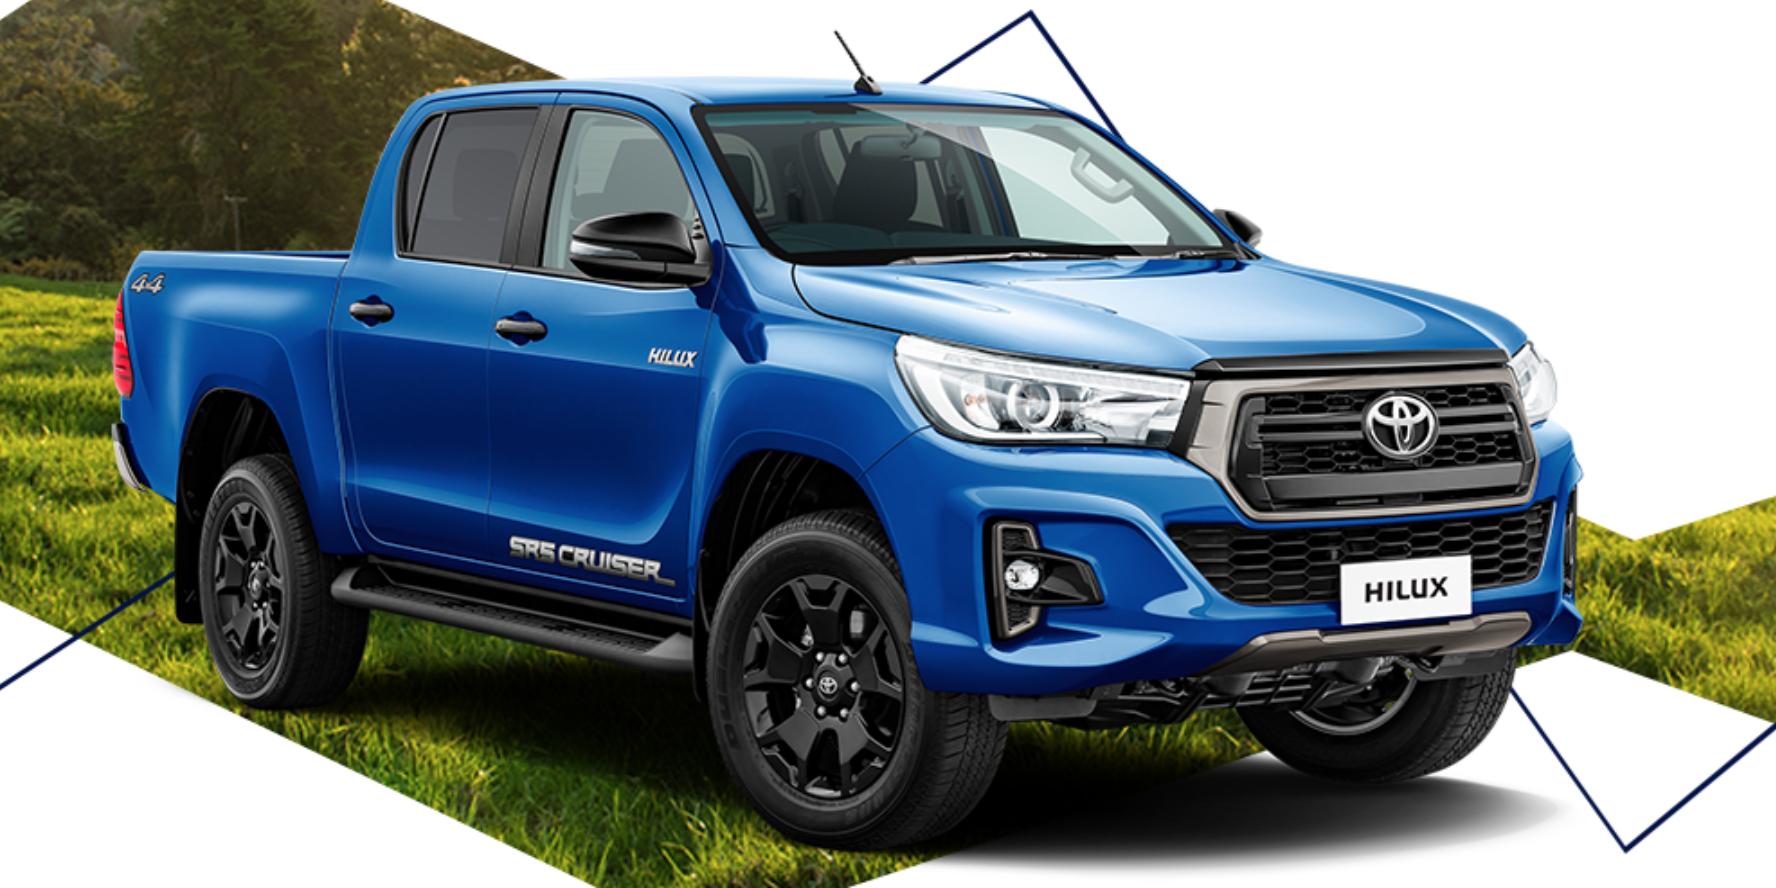 Toyota HiLux SR5 Cruiser Bound For NZ, No Word On